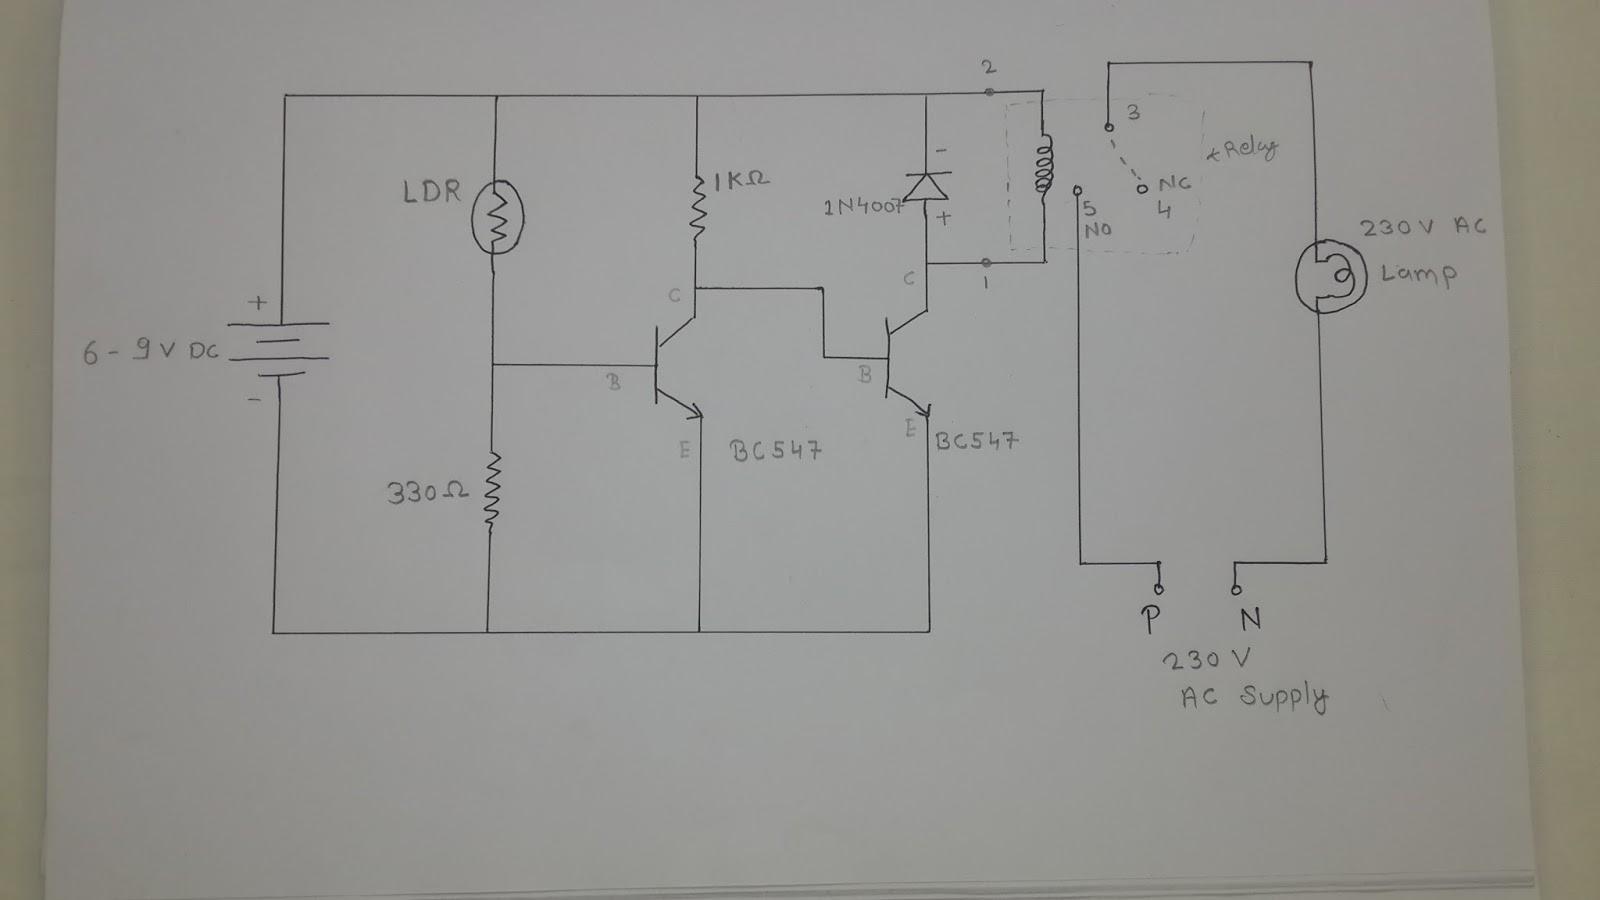 20180113_145202  Way Switch Wiring Diagram Steps on